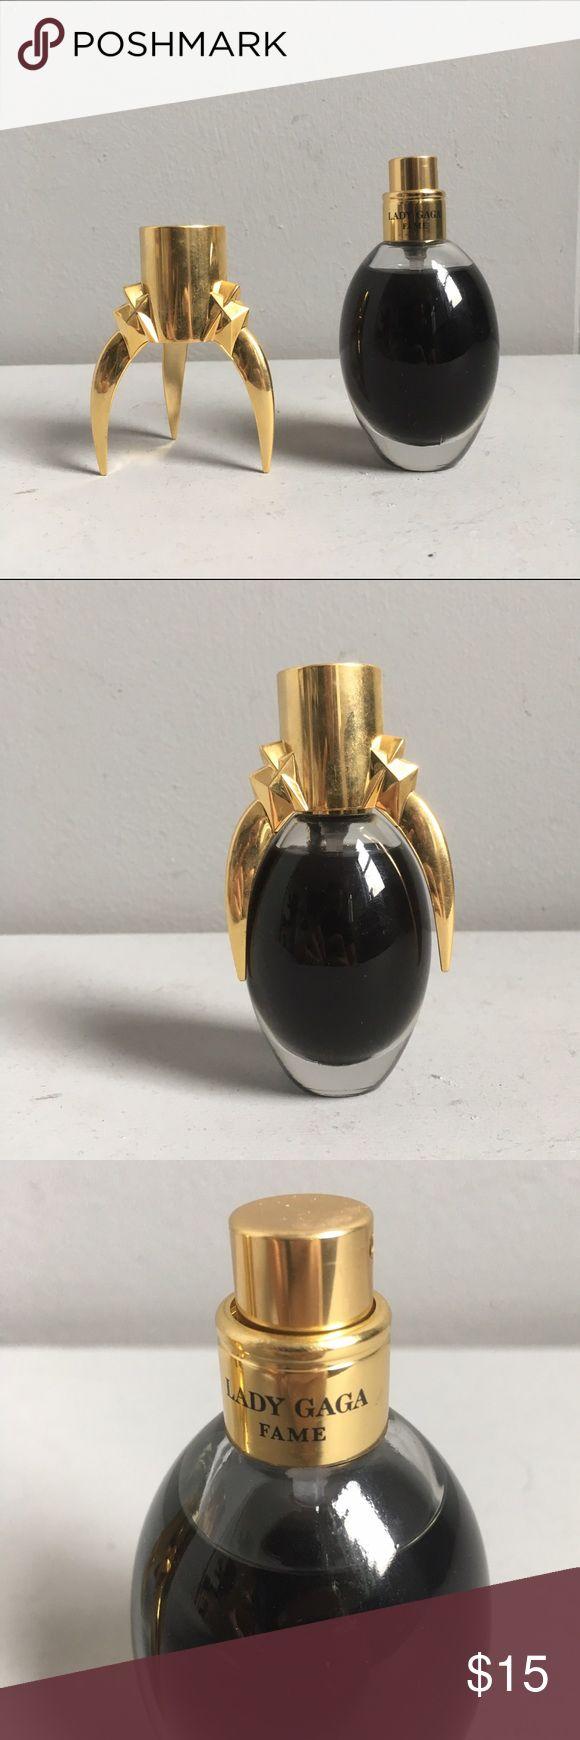 Lady Gaga Fame Perfume FULL Lady Gaga Fame Black Fluid Lady Gaga Other